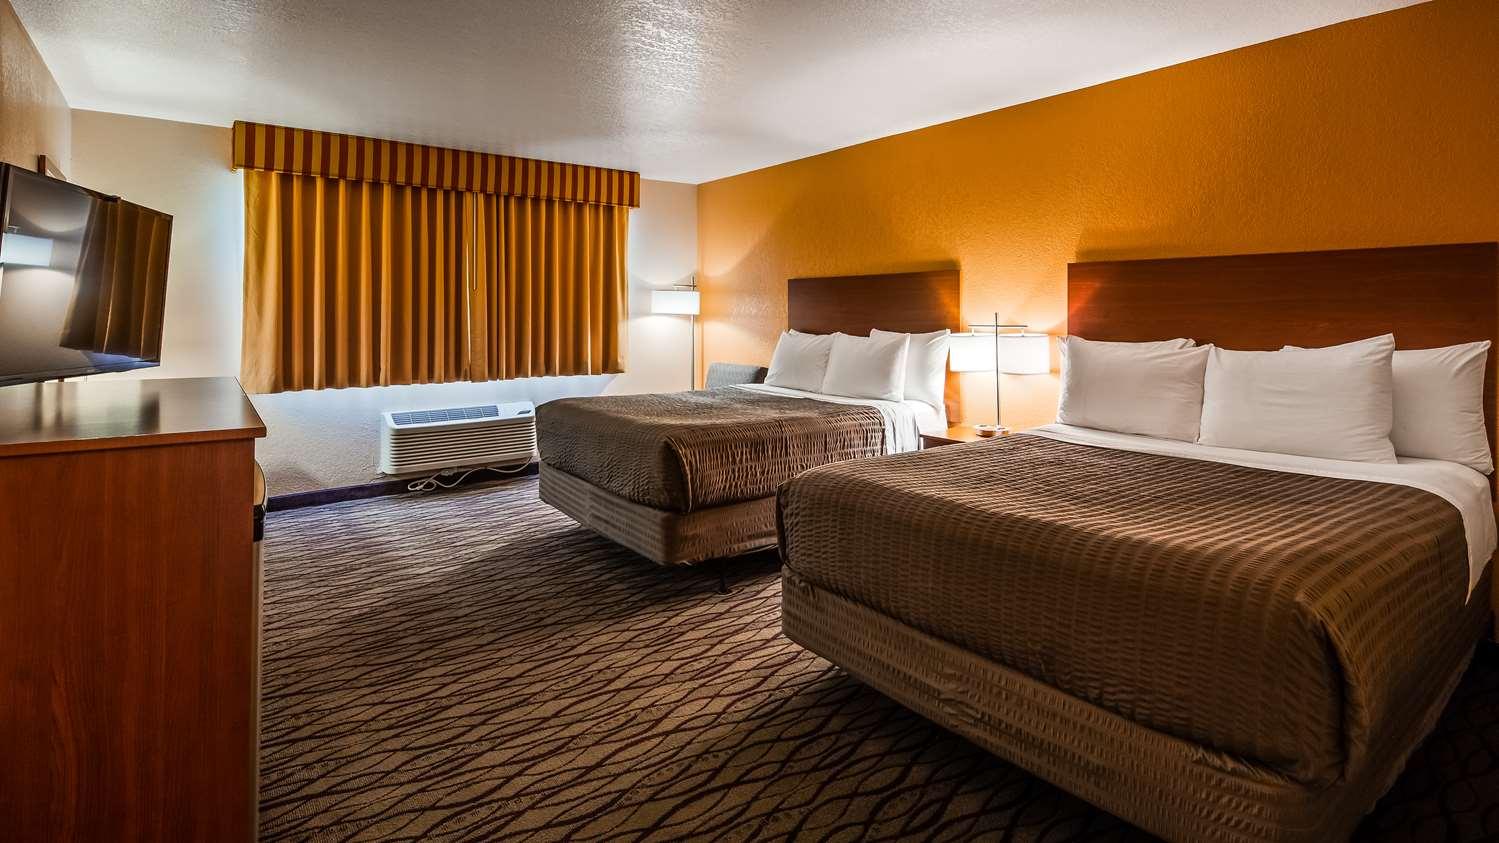 Room - SureStay Hotel by Best Western Wenatchee